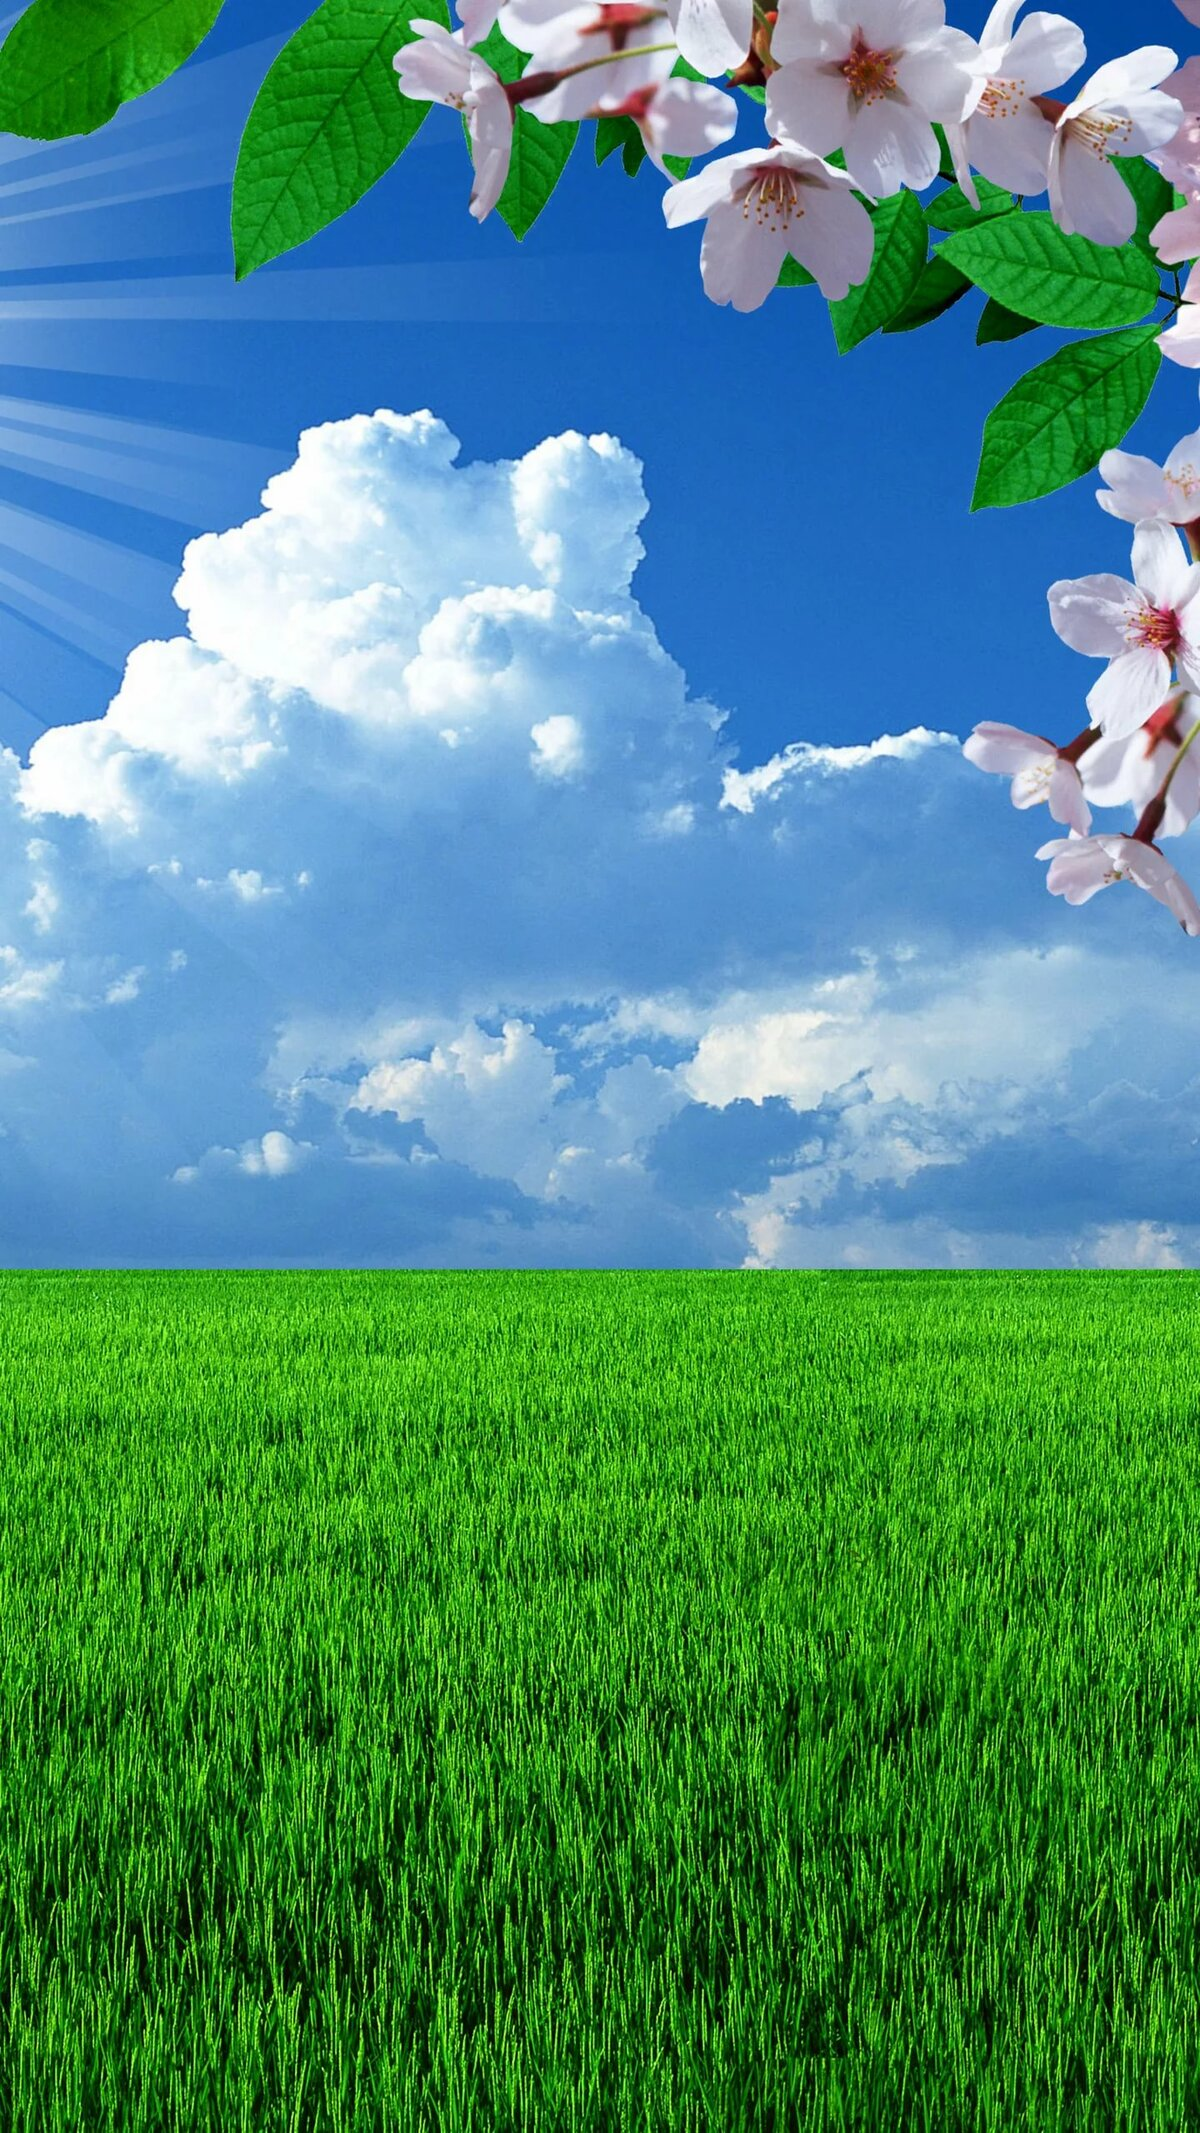 ставил весна картинки на экран телефона добавил вас